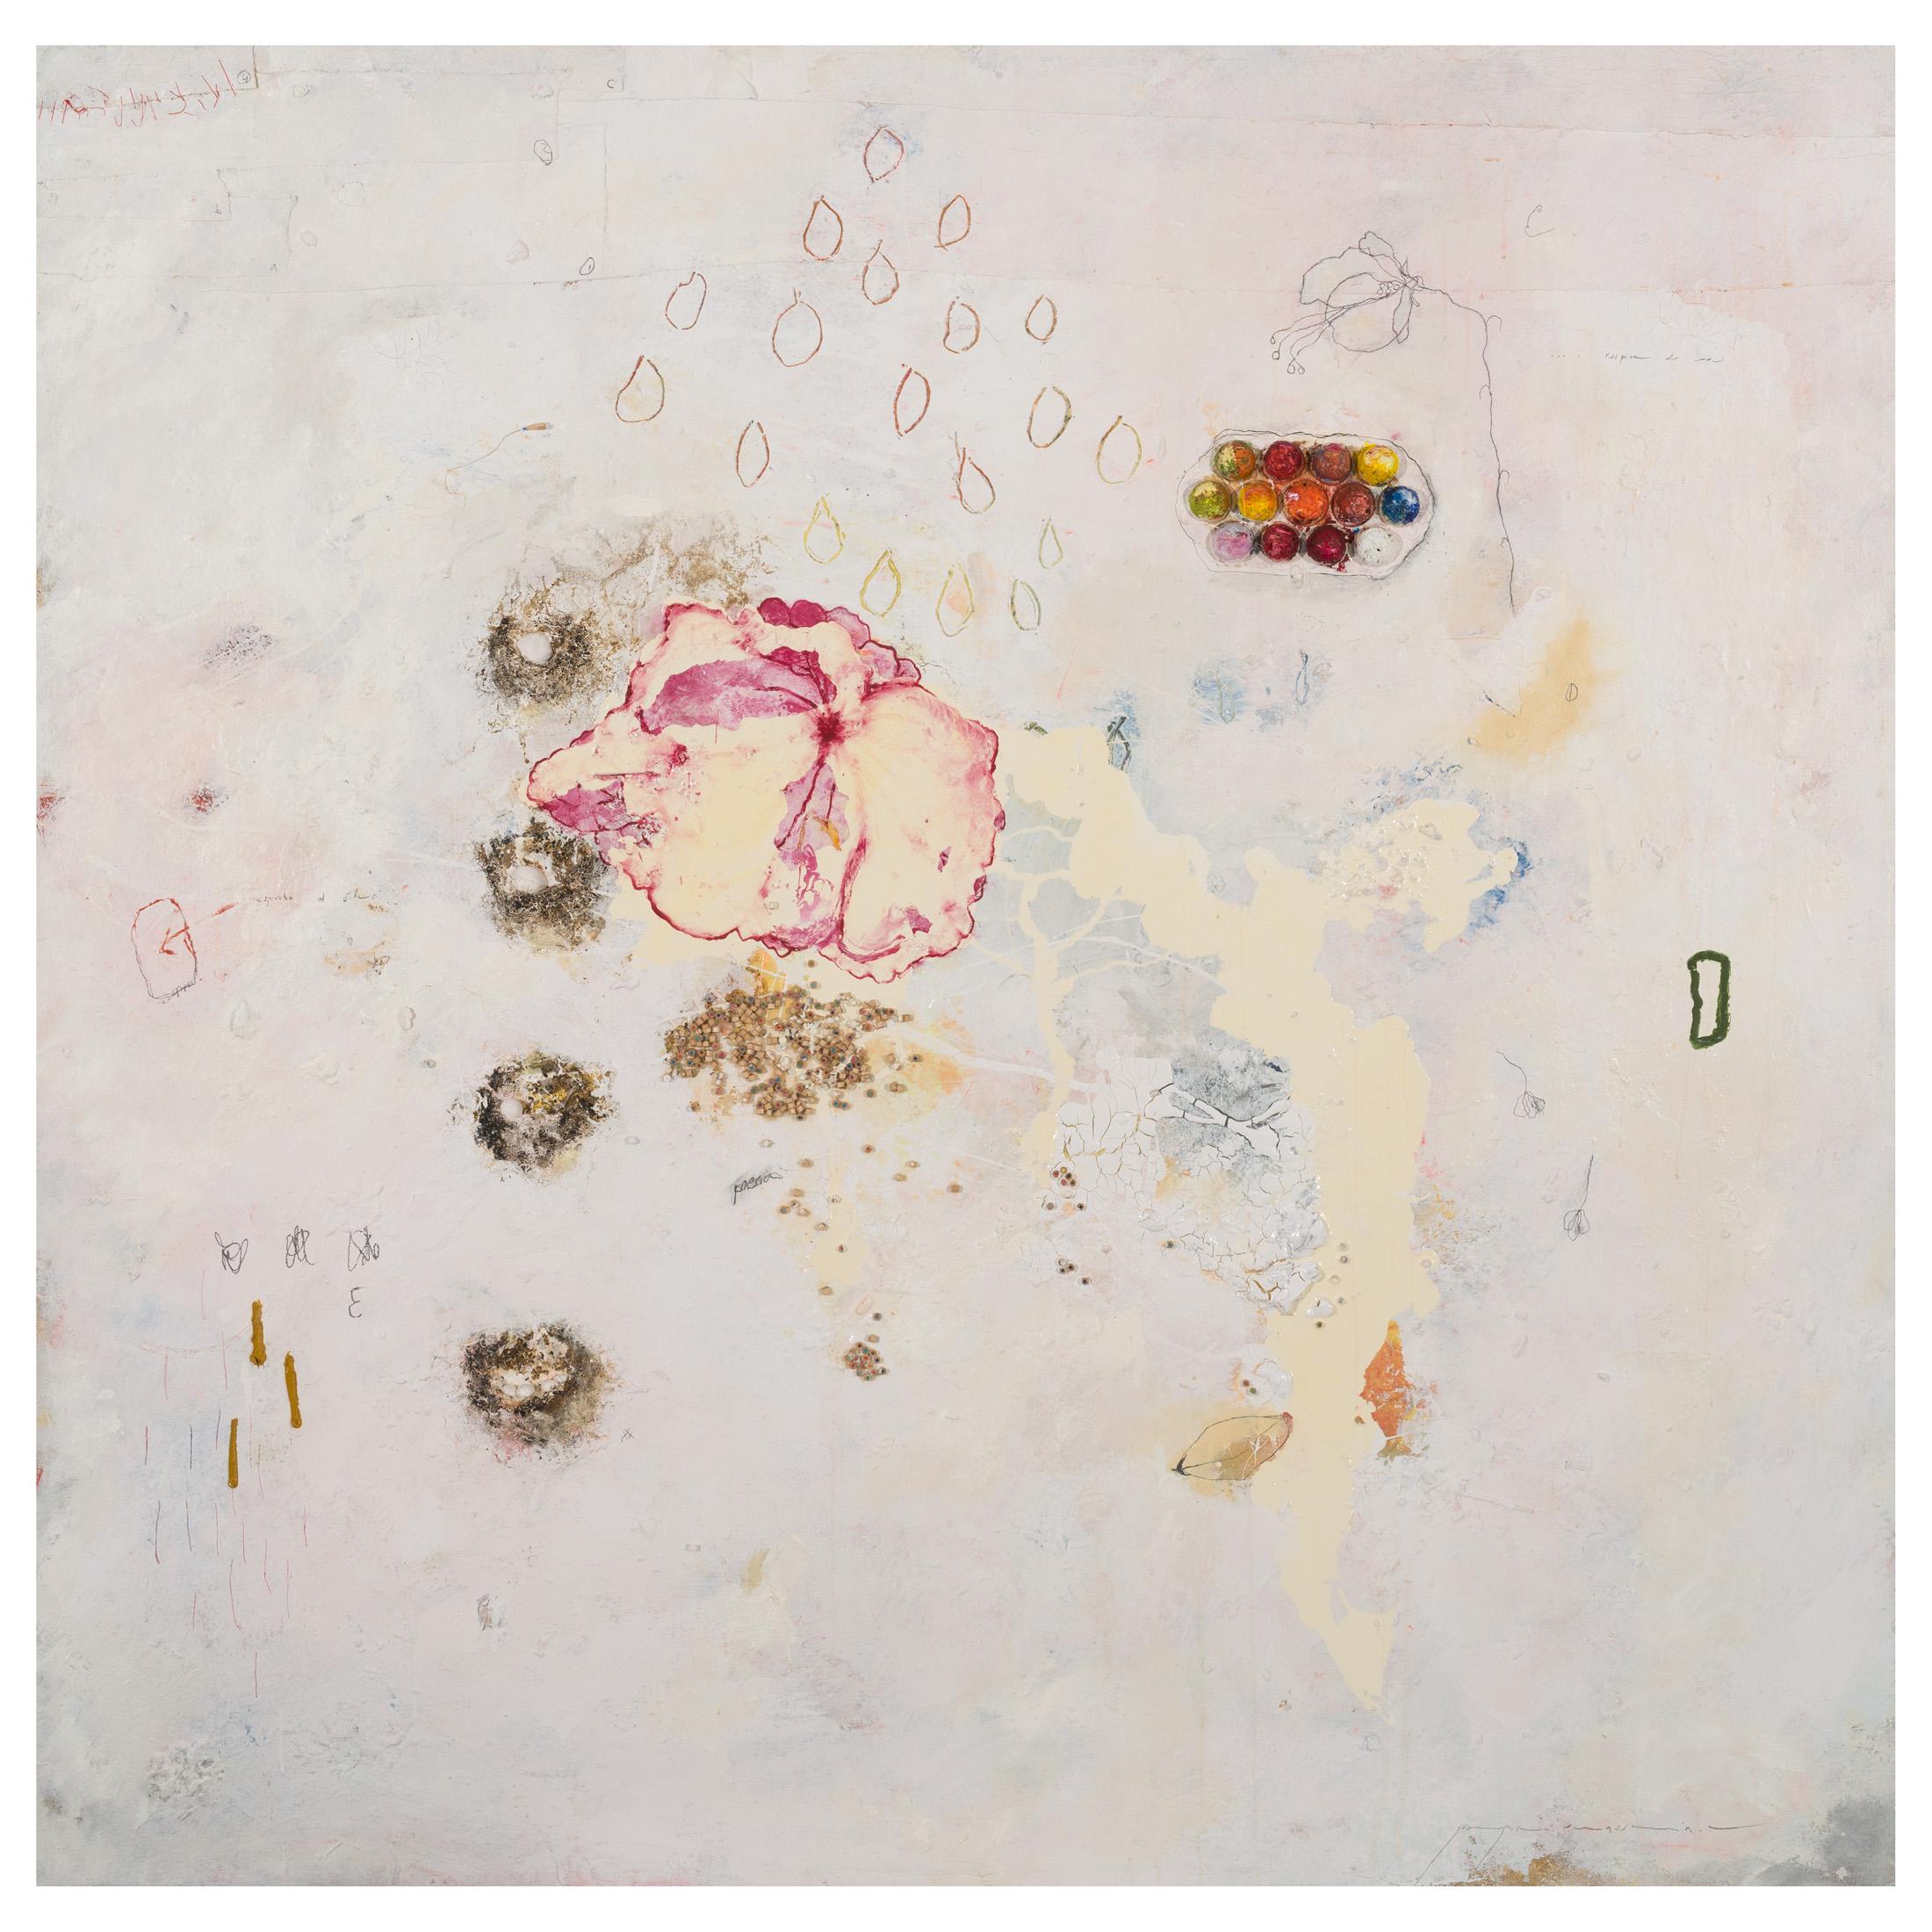 Pequeñas gotas de rocío. (2018) - Joan Pere Massana i Blanch - Joanpere Massana